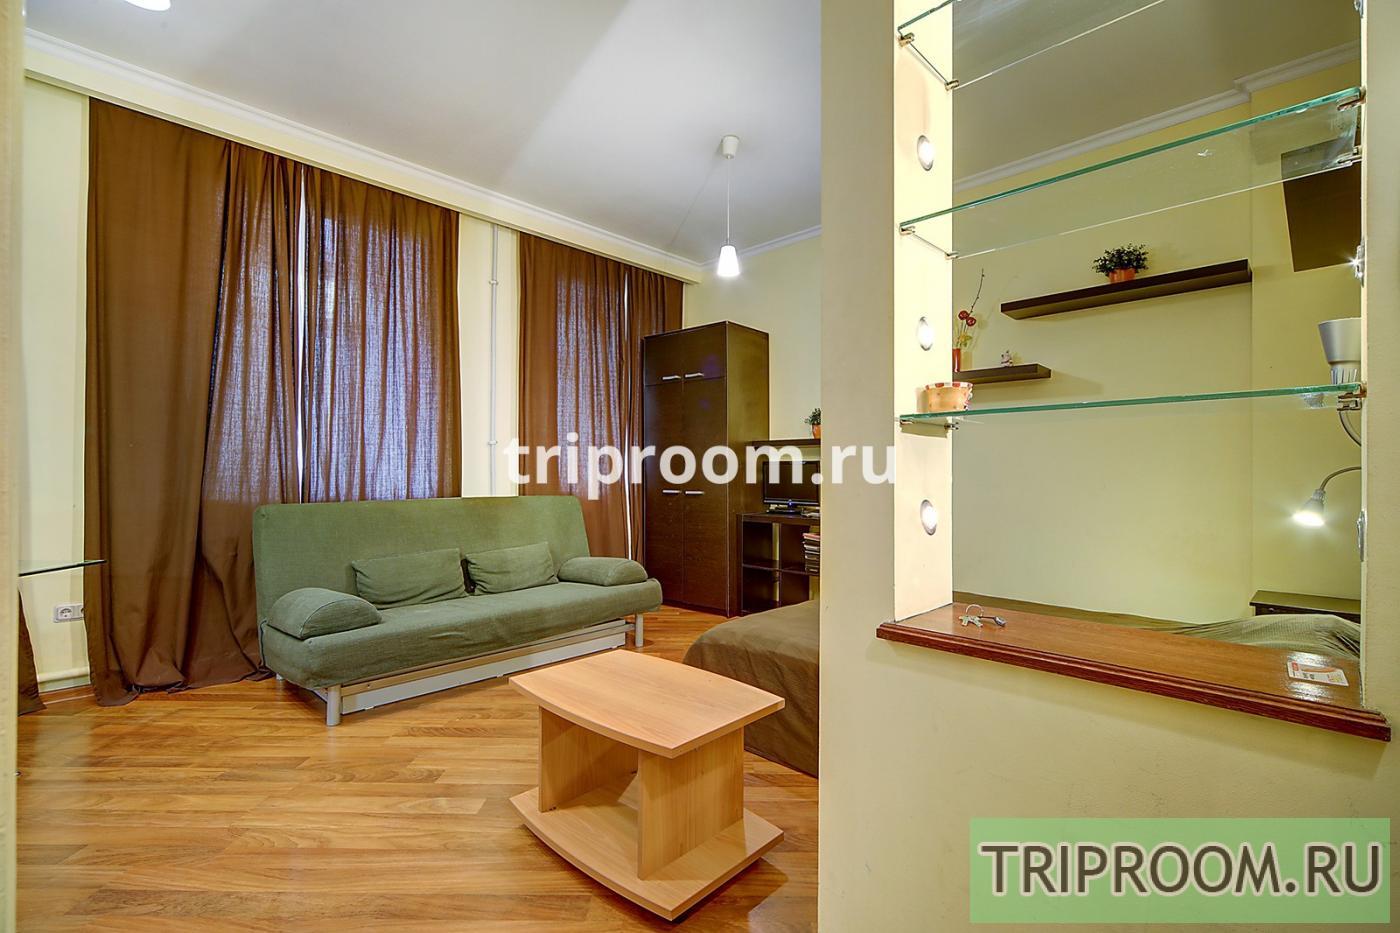 1-комнатная квартира посуточно (вариант № 15117), ул. Канала Грибоедова набережная, фото № 11